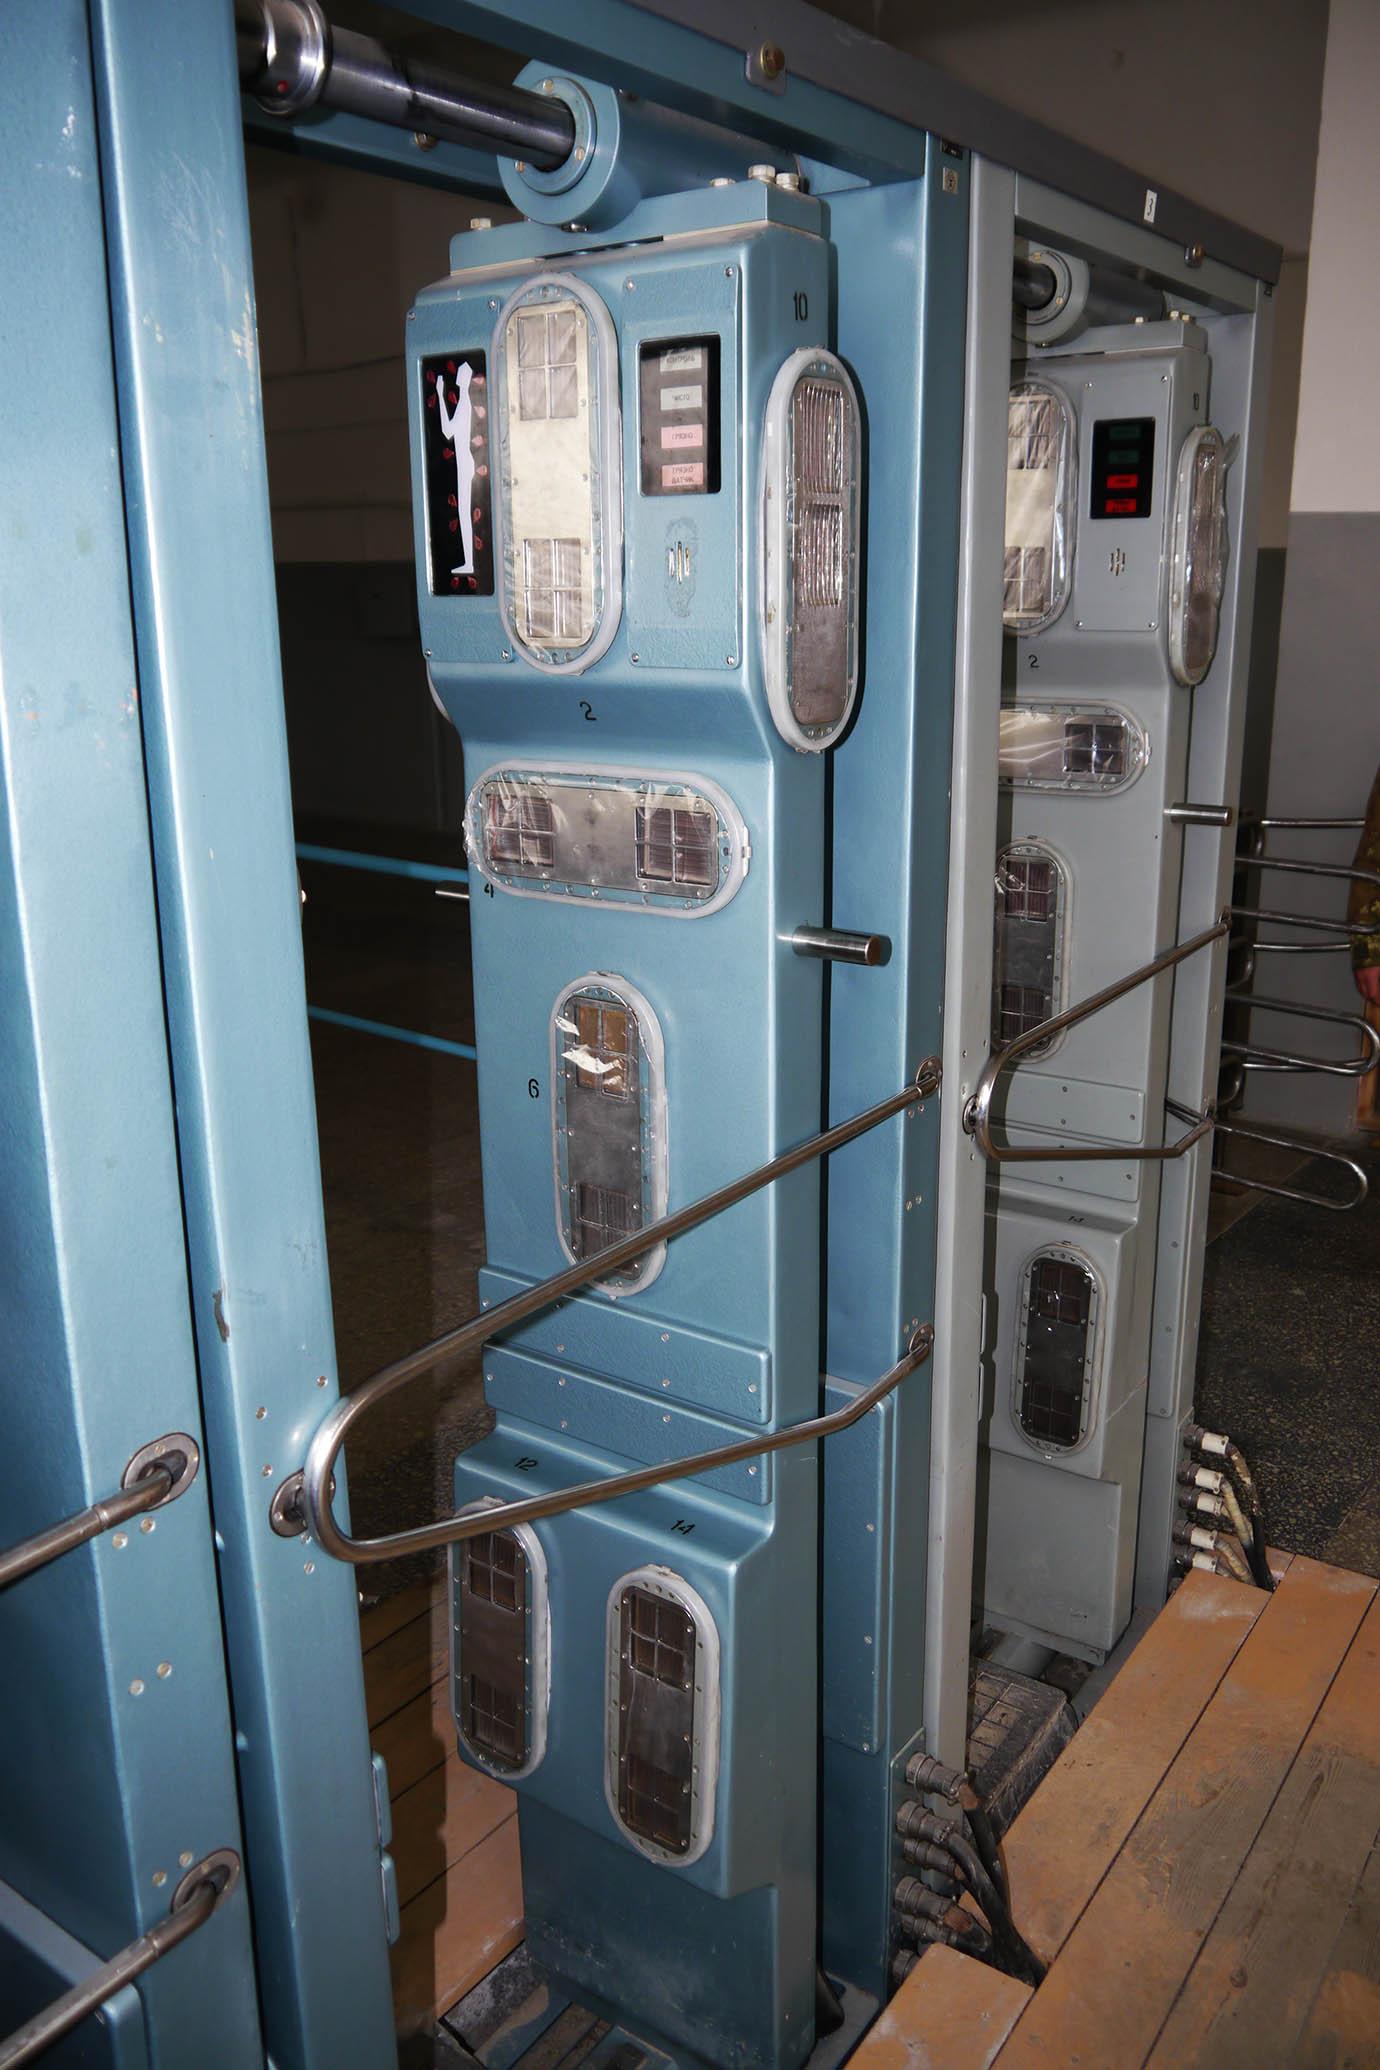 chernobyl-cafeteria50